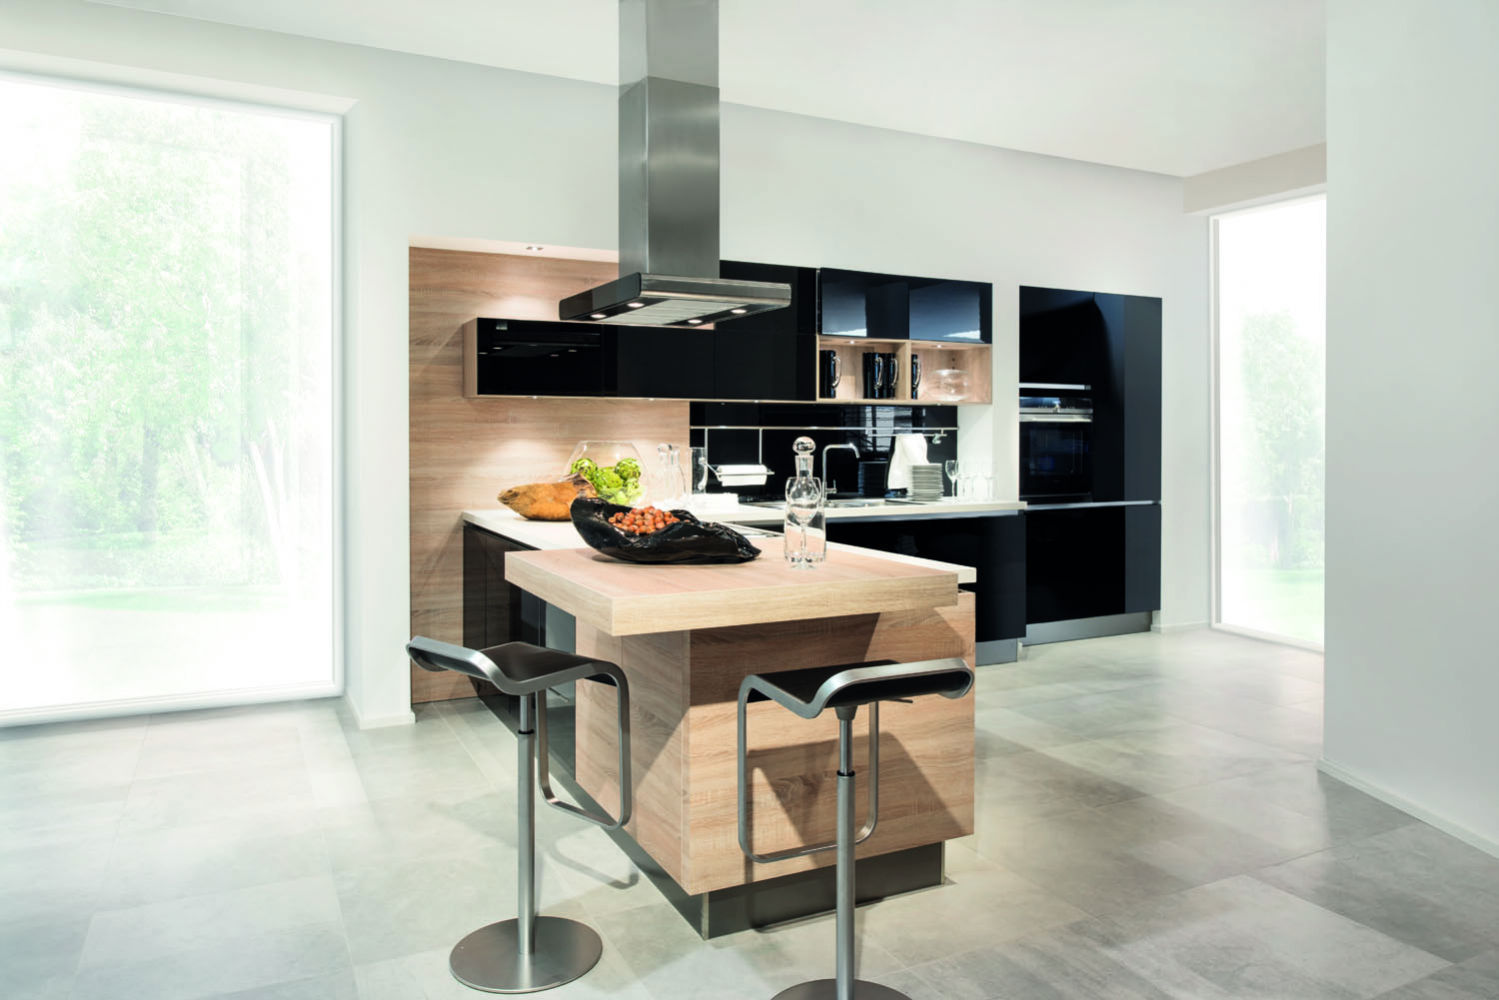 Cuisine bourg en bresse d cor home cuisiniste mobilier for Mobilier cuisine